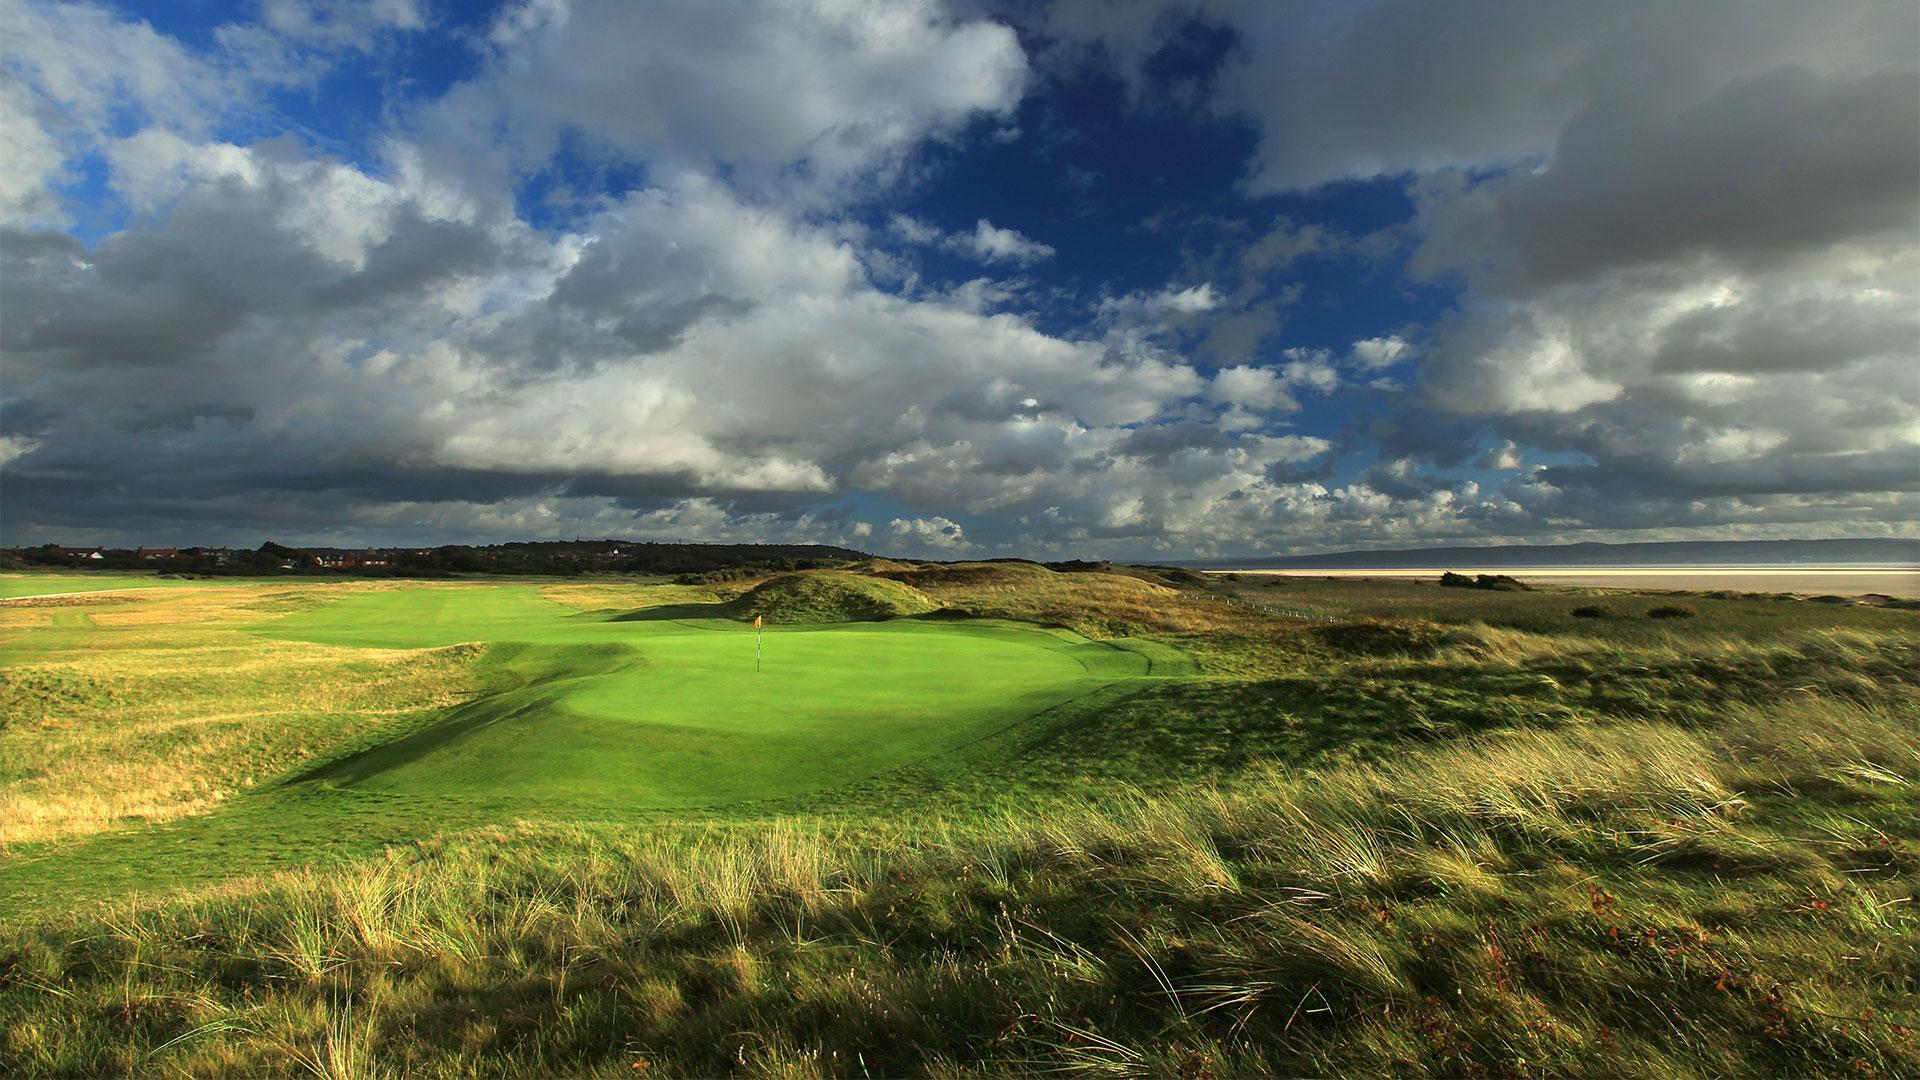 royal liverpool golf club hoylake